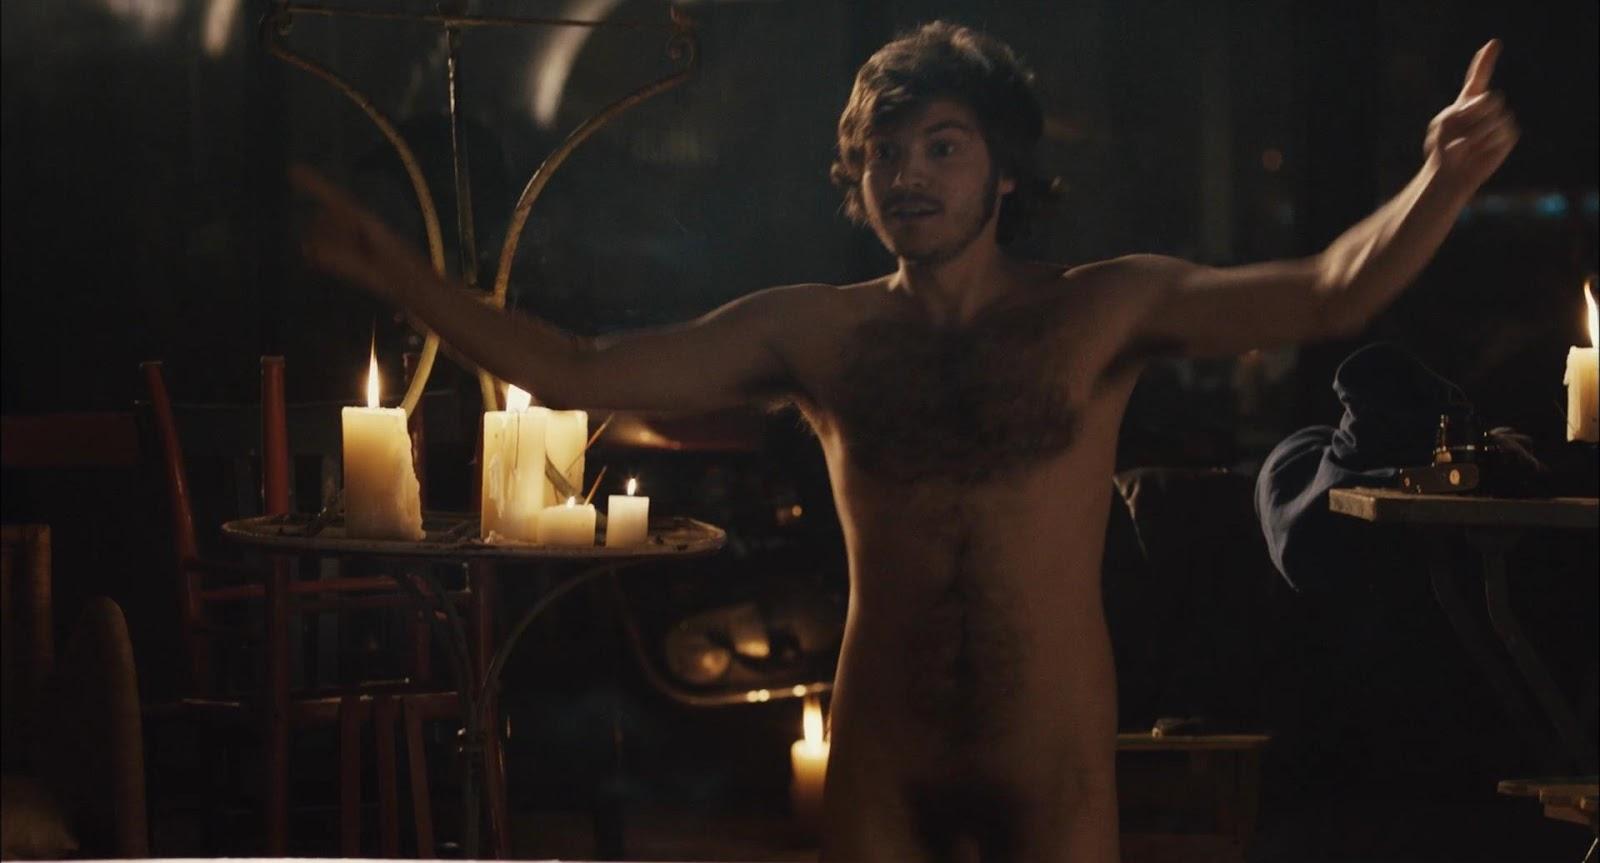 Josh's naked ambition